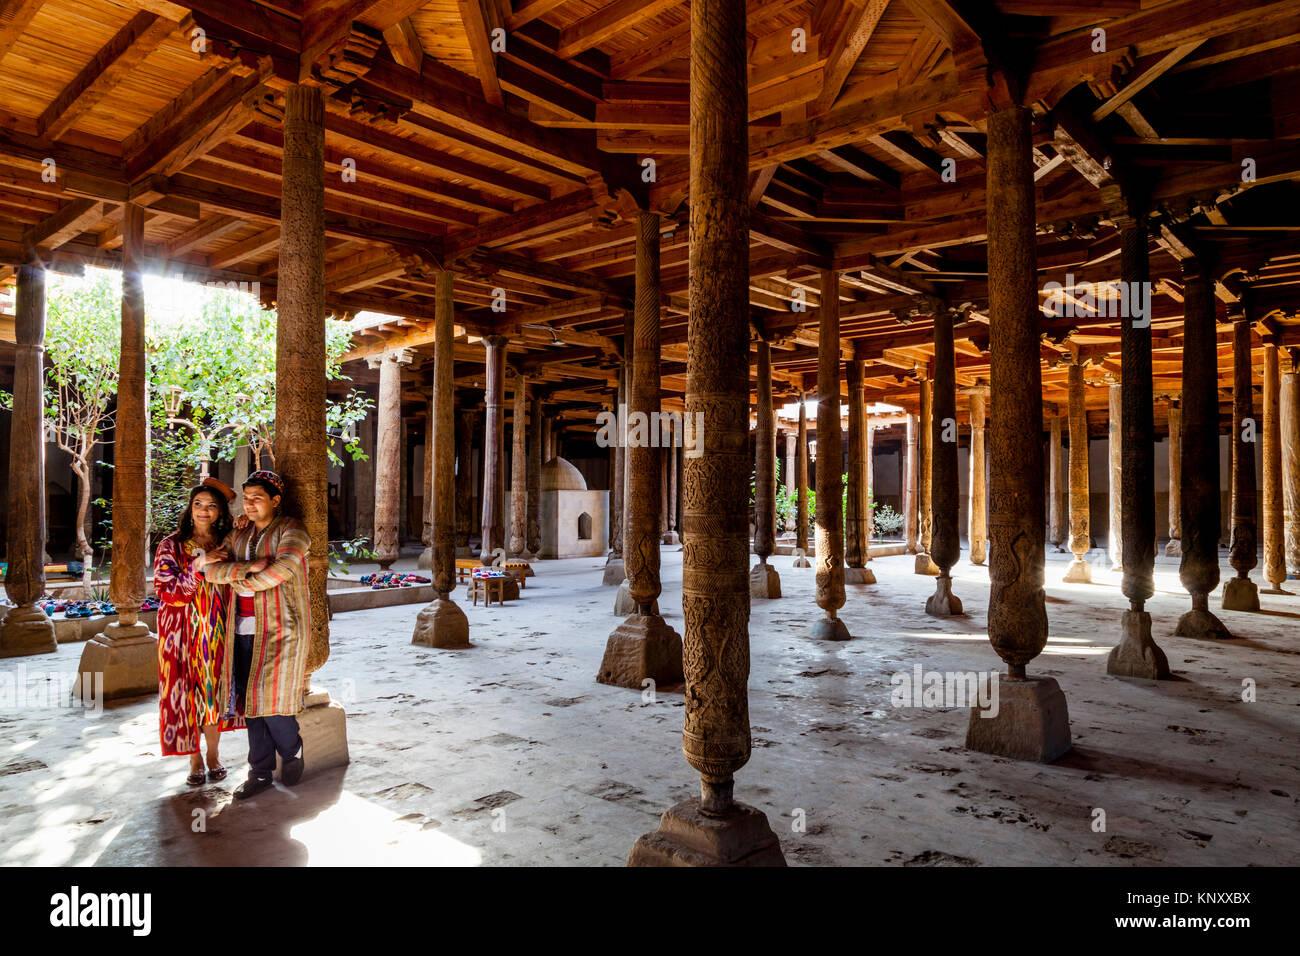 Uzbek People In Traditional Dress In The Juma Mosque, Khiva, Uzbekistan - Stock Image